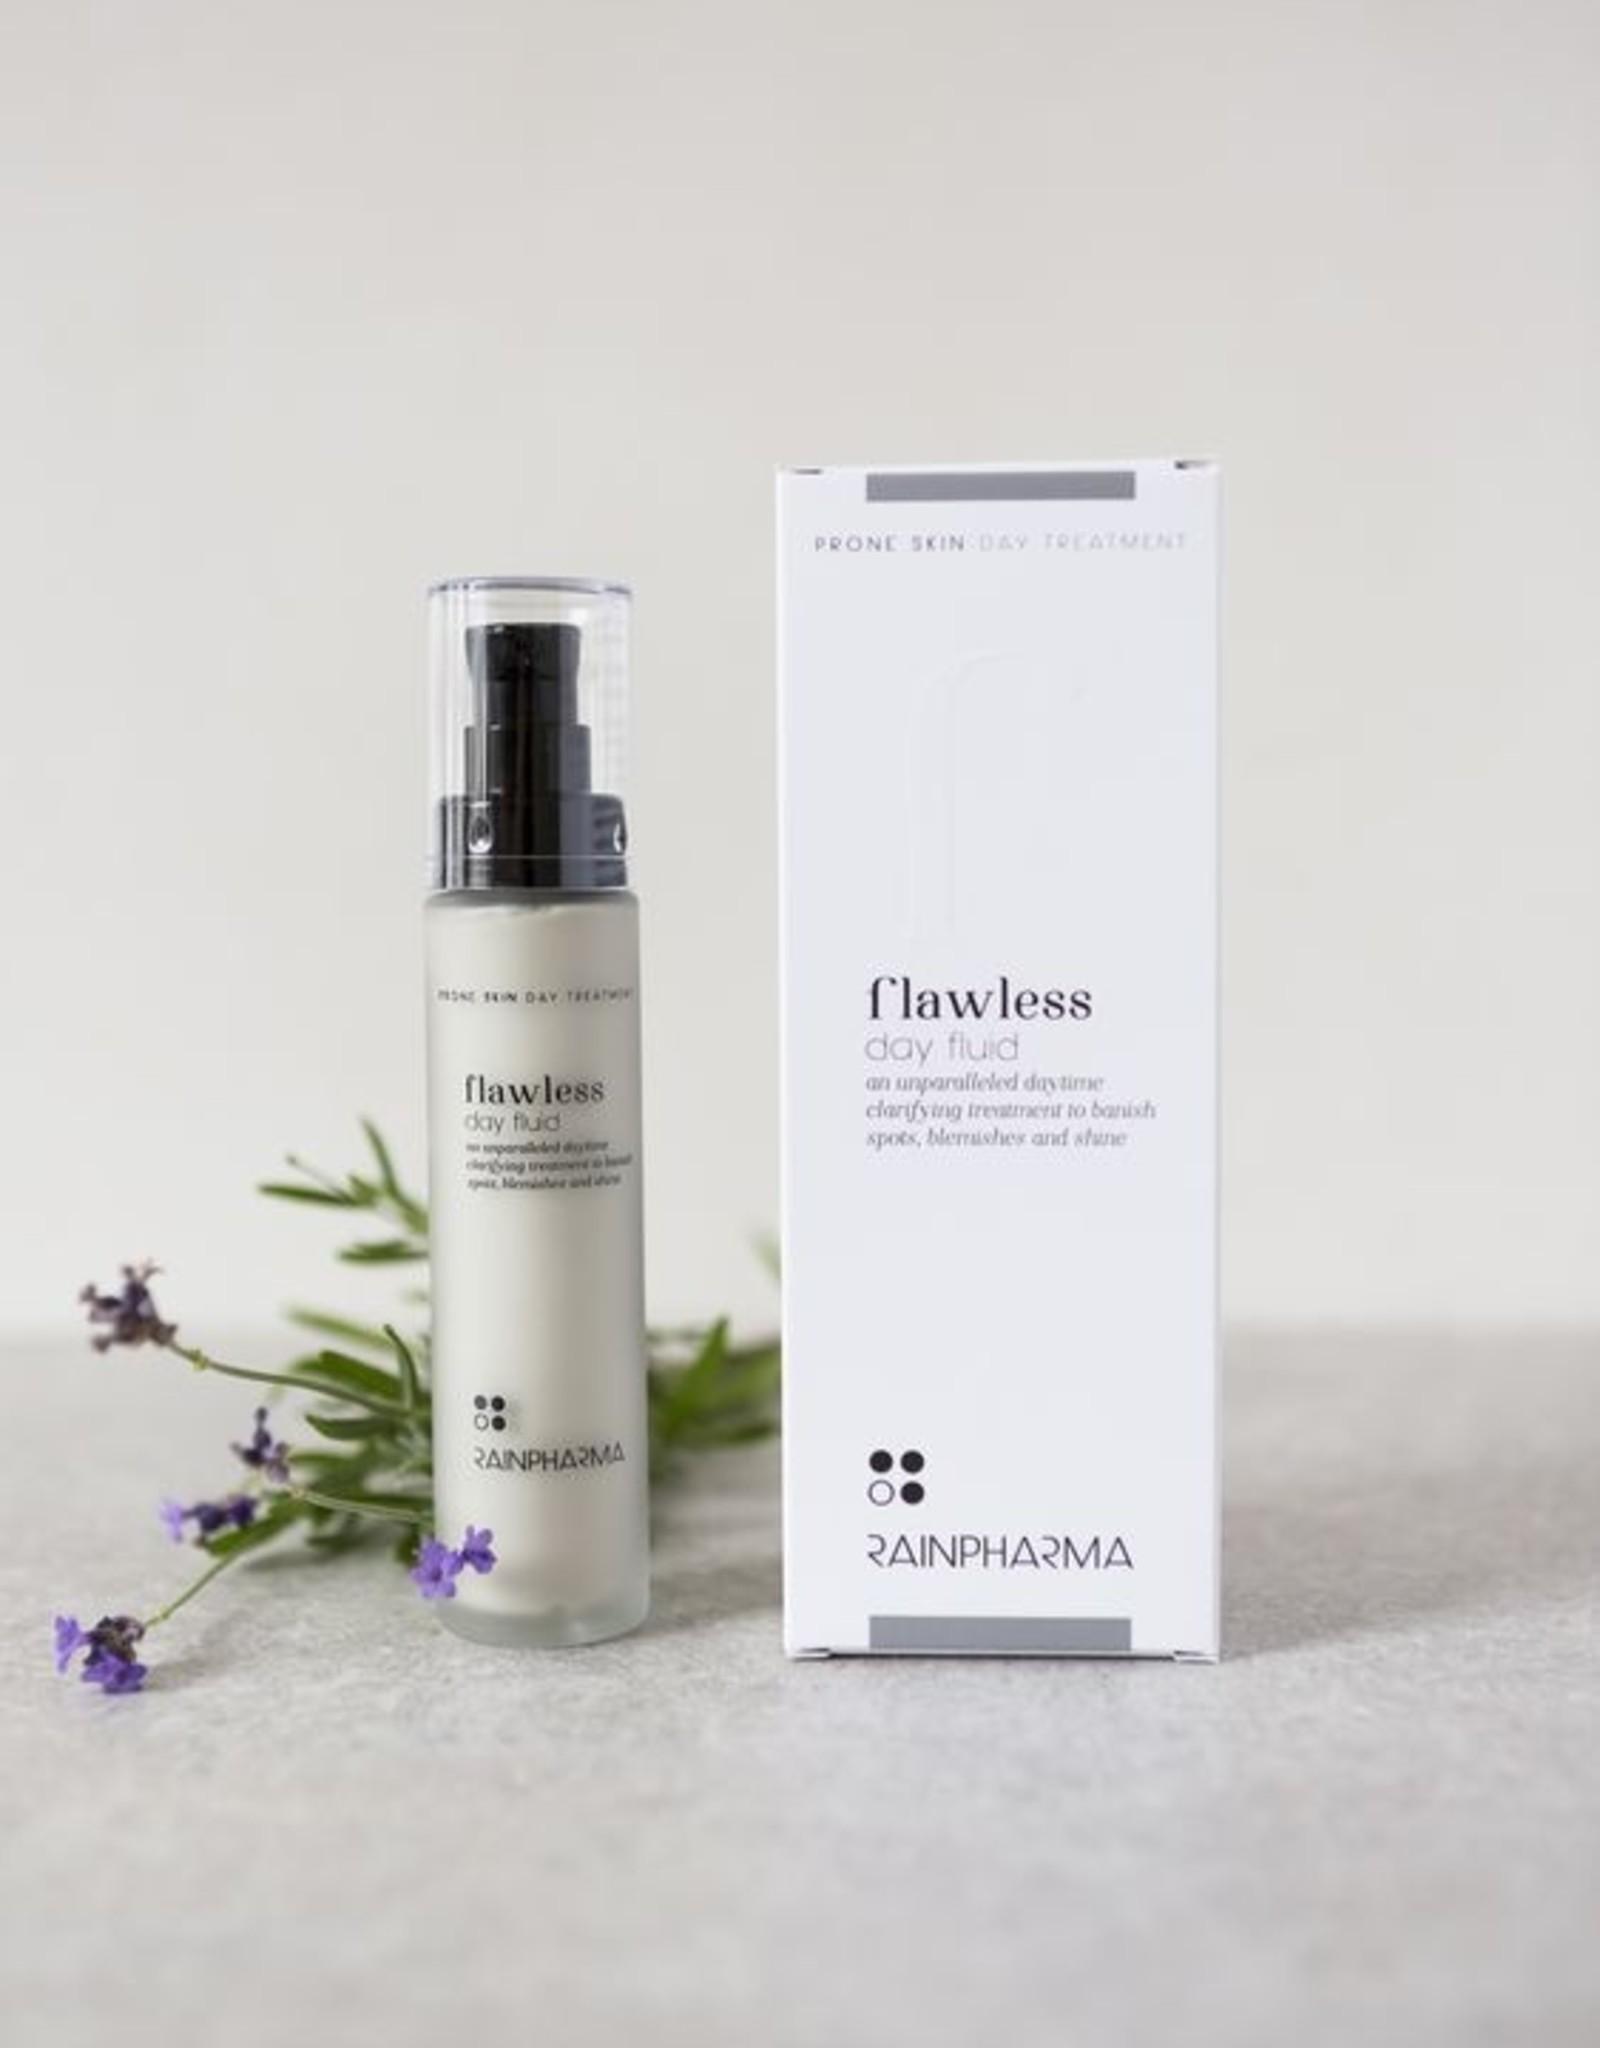 RainPharma Flawless Day Fluid 50ml - Rainpharma